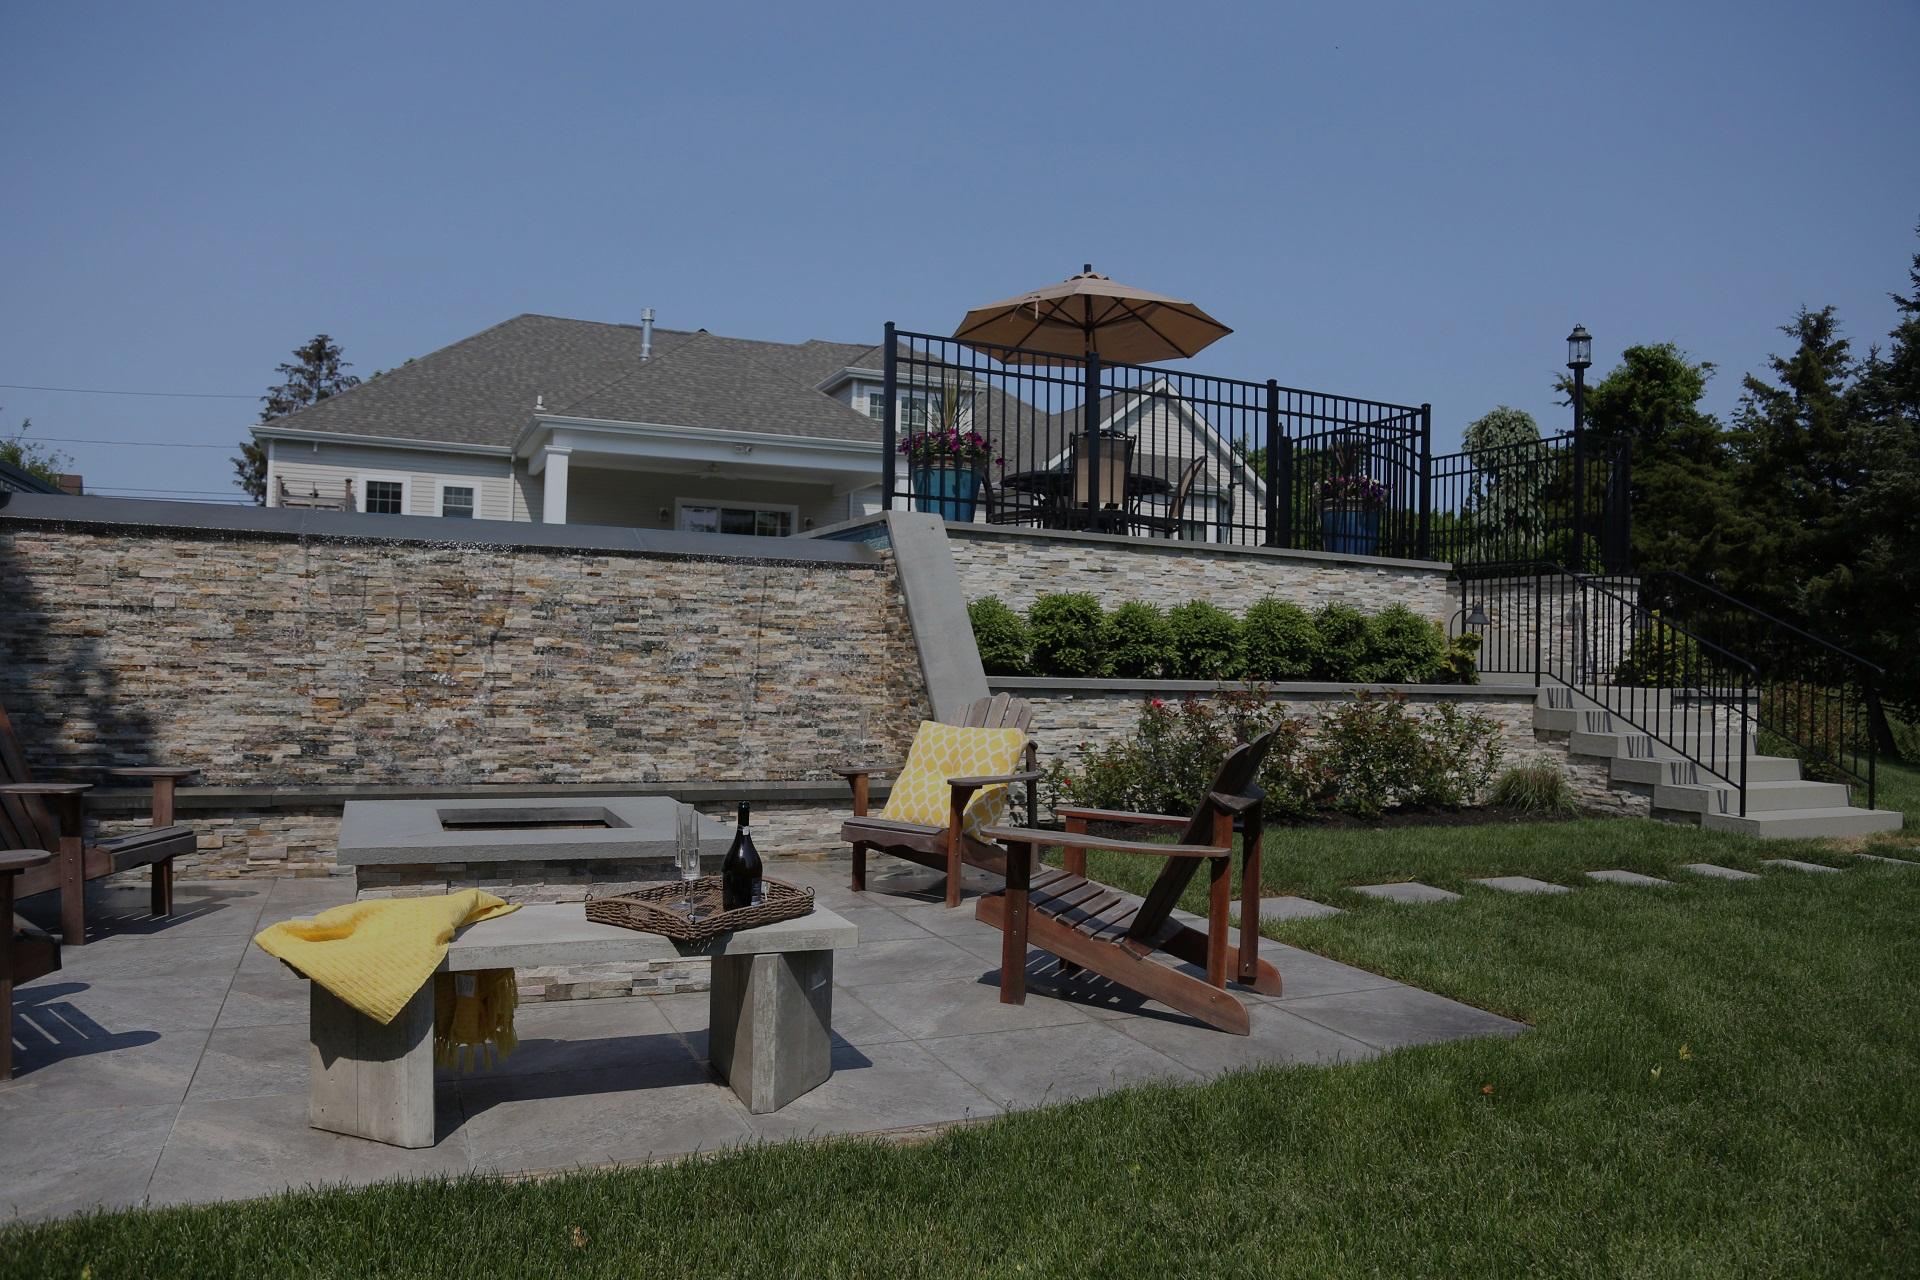 FAMILY-Friendly Retreat - East Moriches, NY